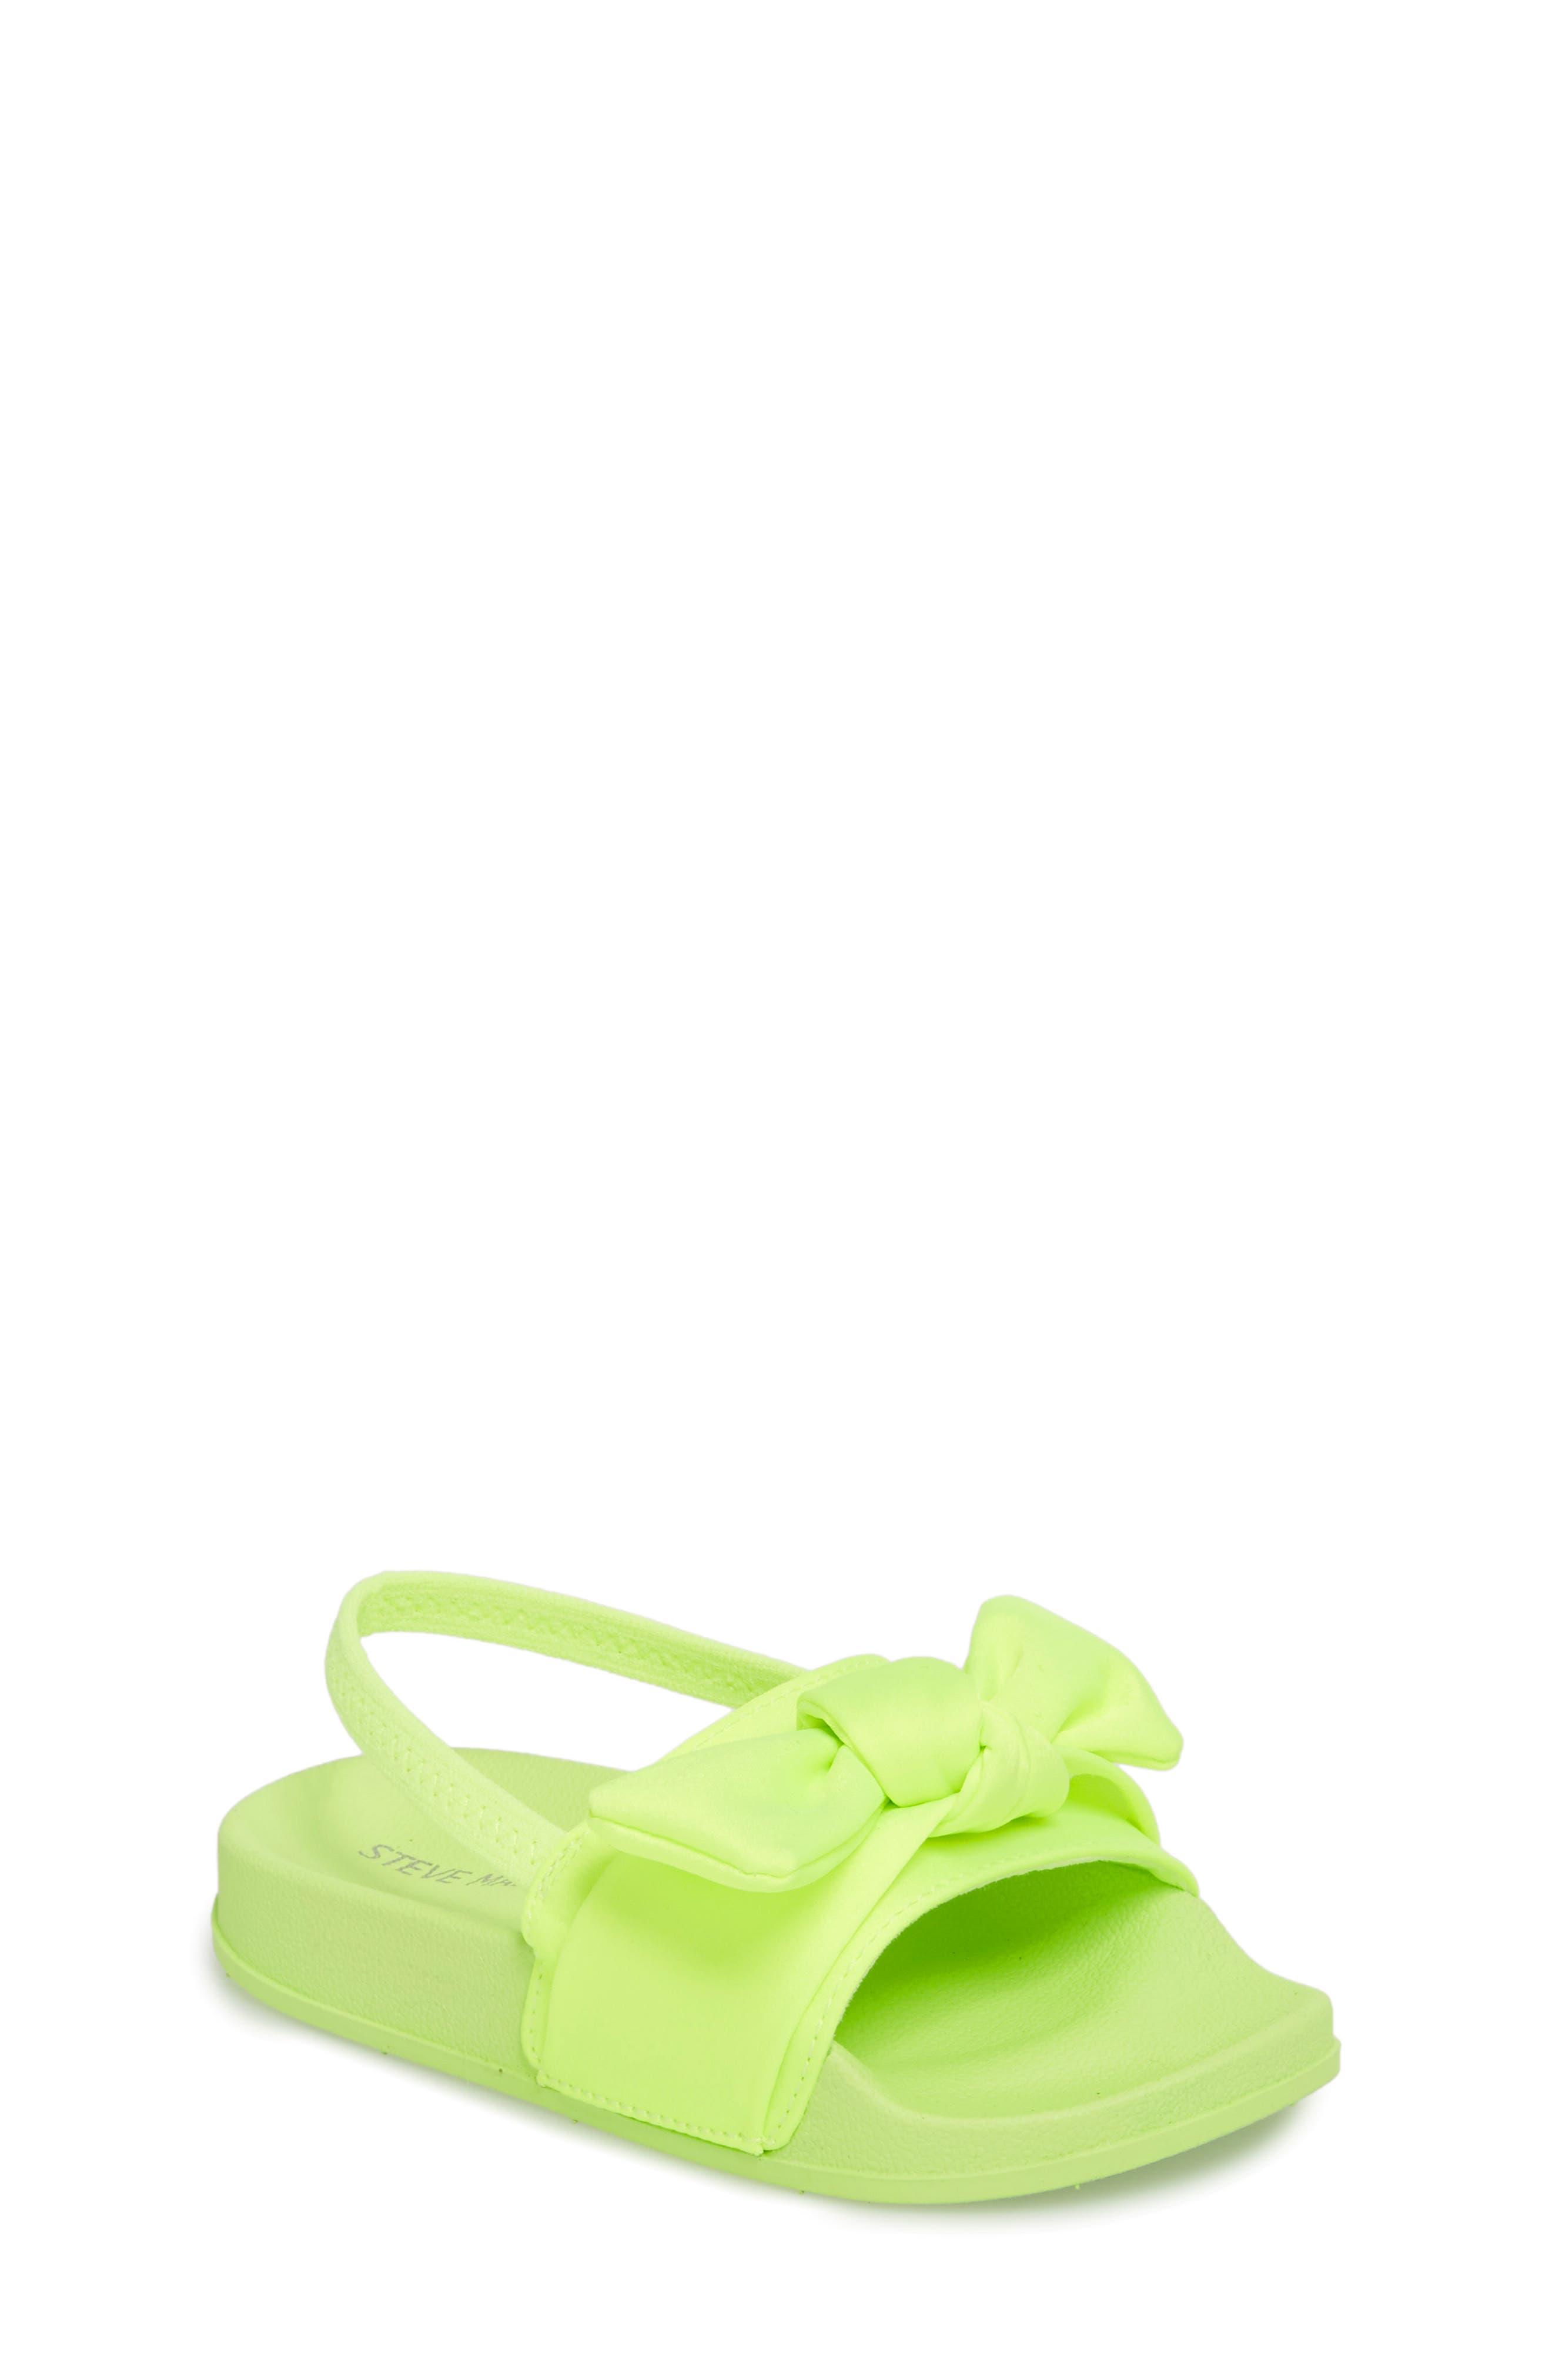 Tsilky Knotted Slide Sandal,                             Main thumbnail 1, color,                             Citron